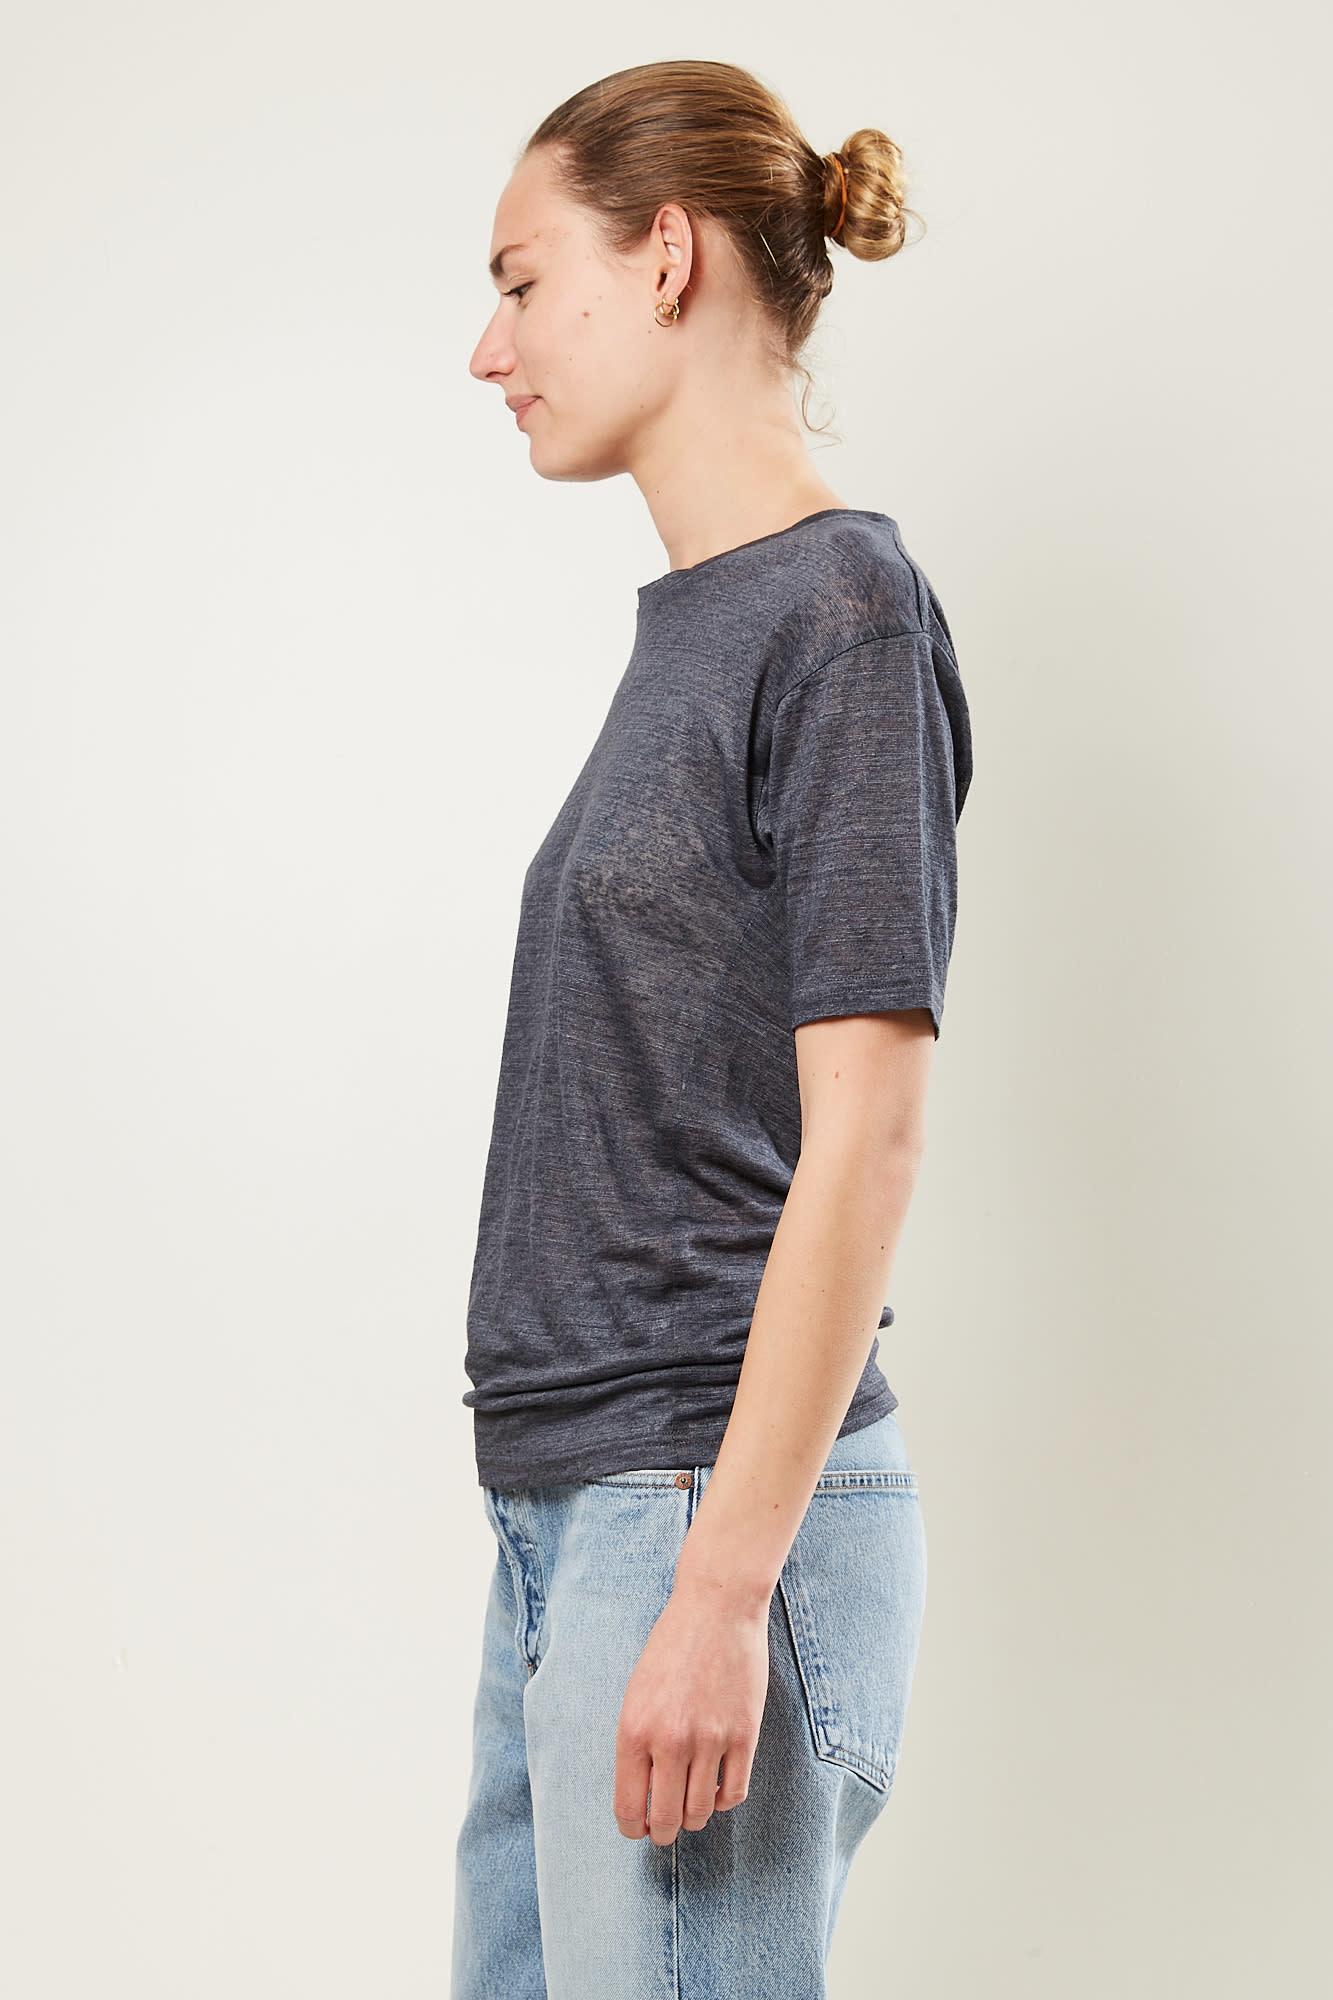 Isabel Marant - madjo tee shirt antracite